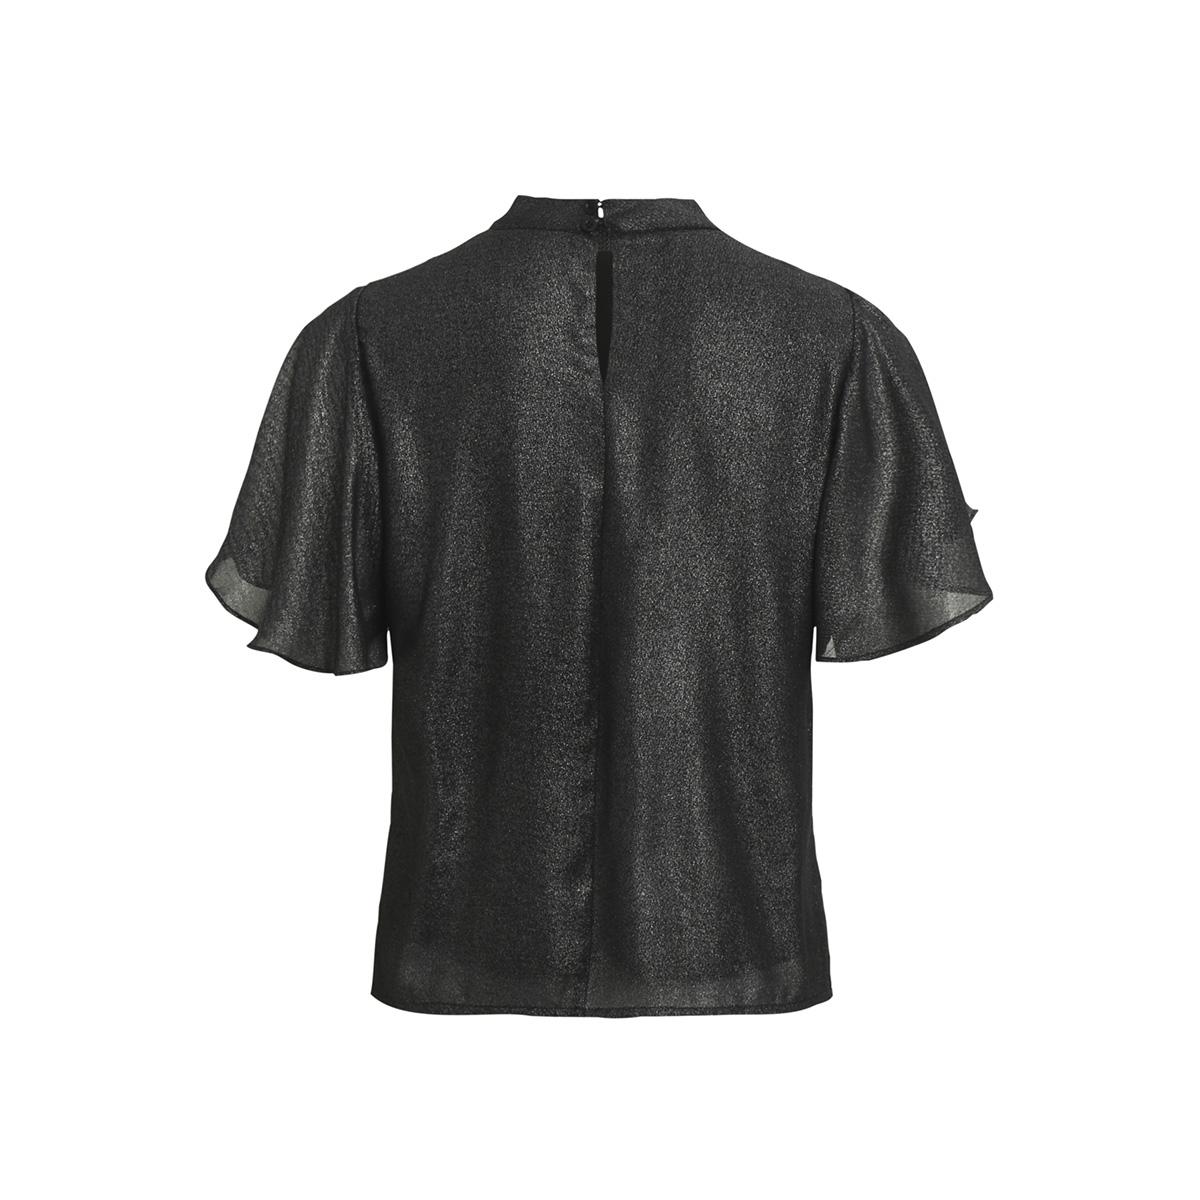 objglimmer s/s choker top a bf 23026689 object t-shirt black silver foil